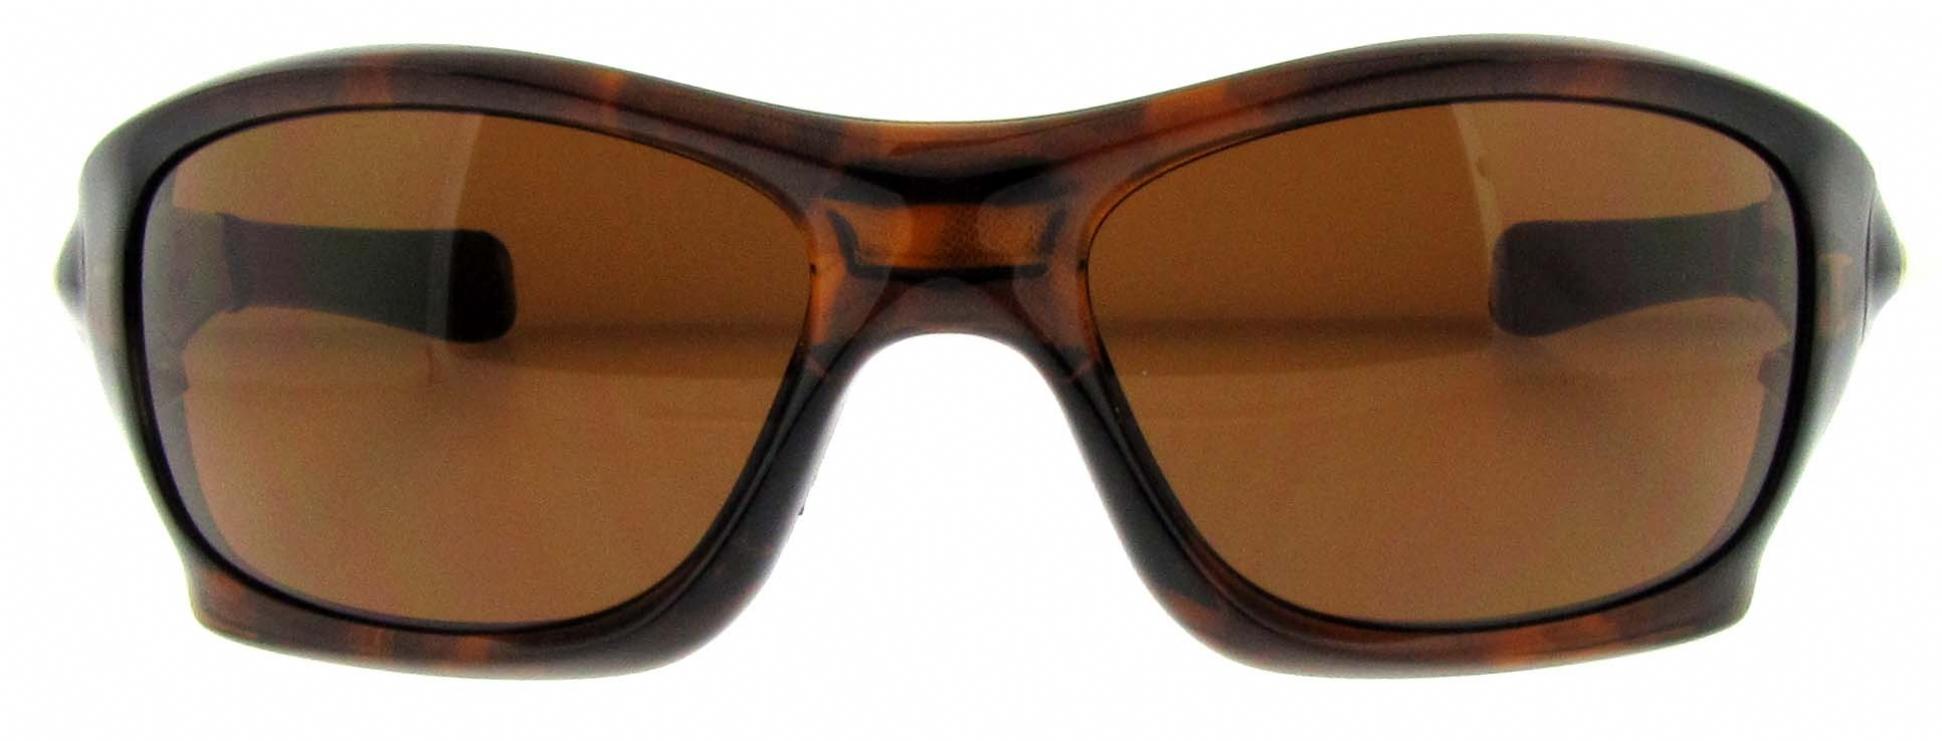 8516f2091f Oakley Mens Flak Jacket 52mm Sunglasses « Heritage Malta